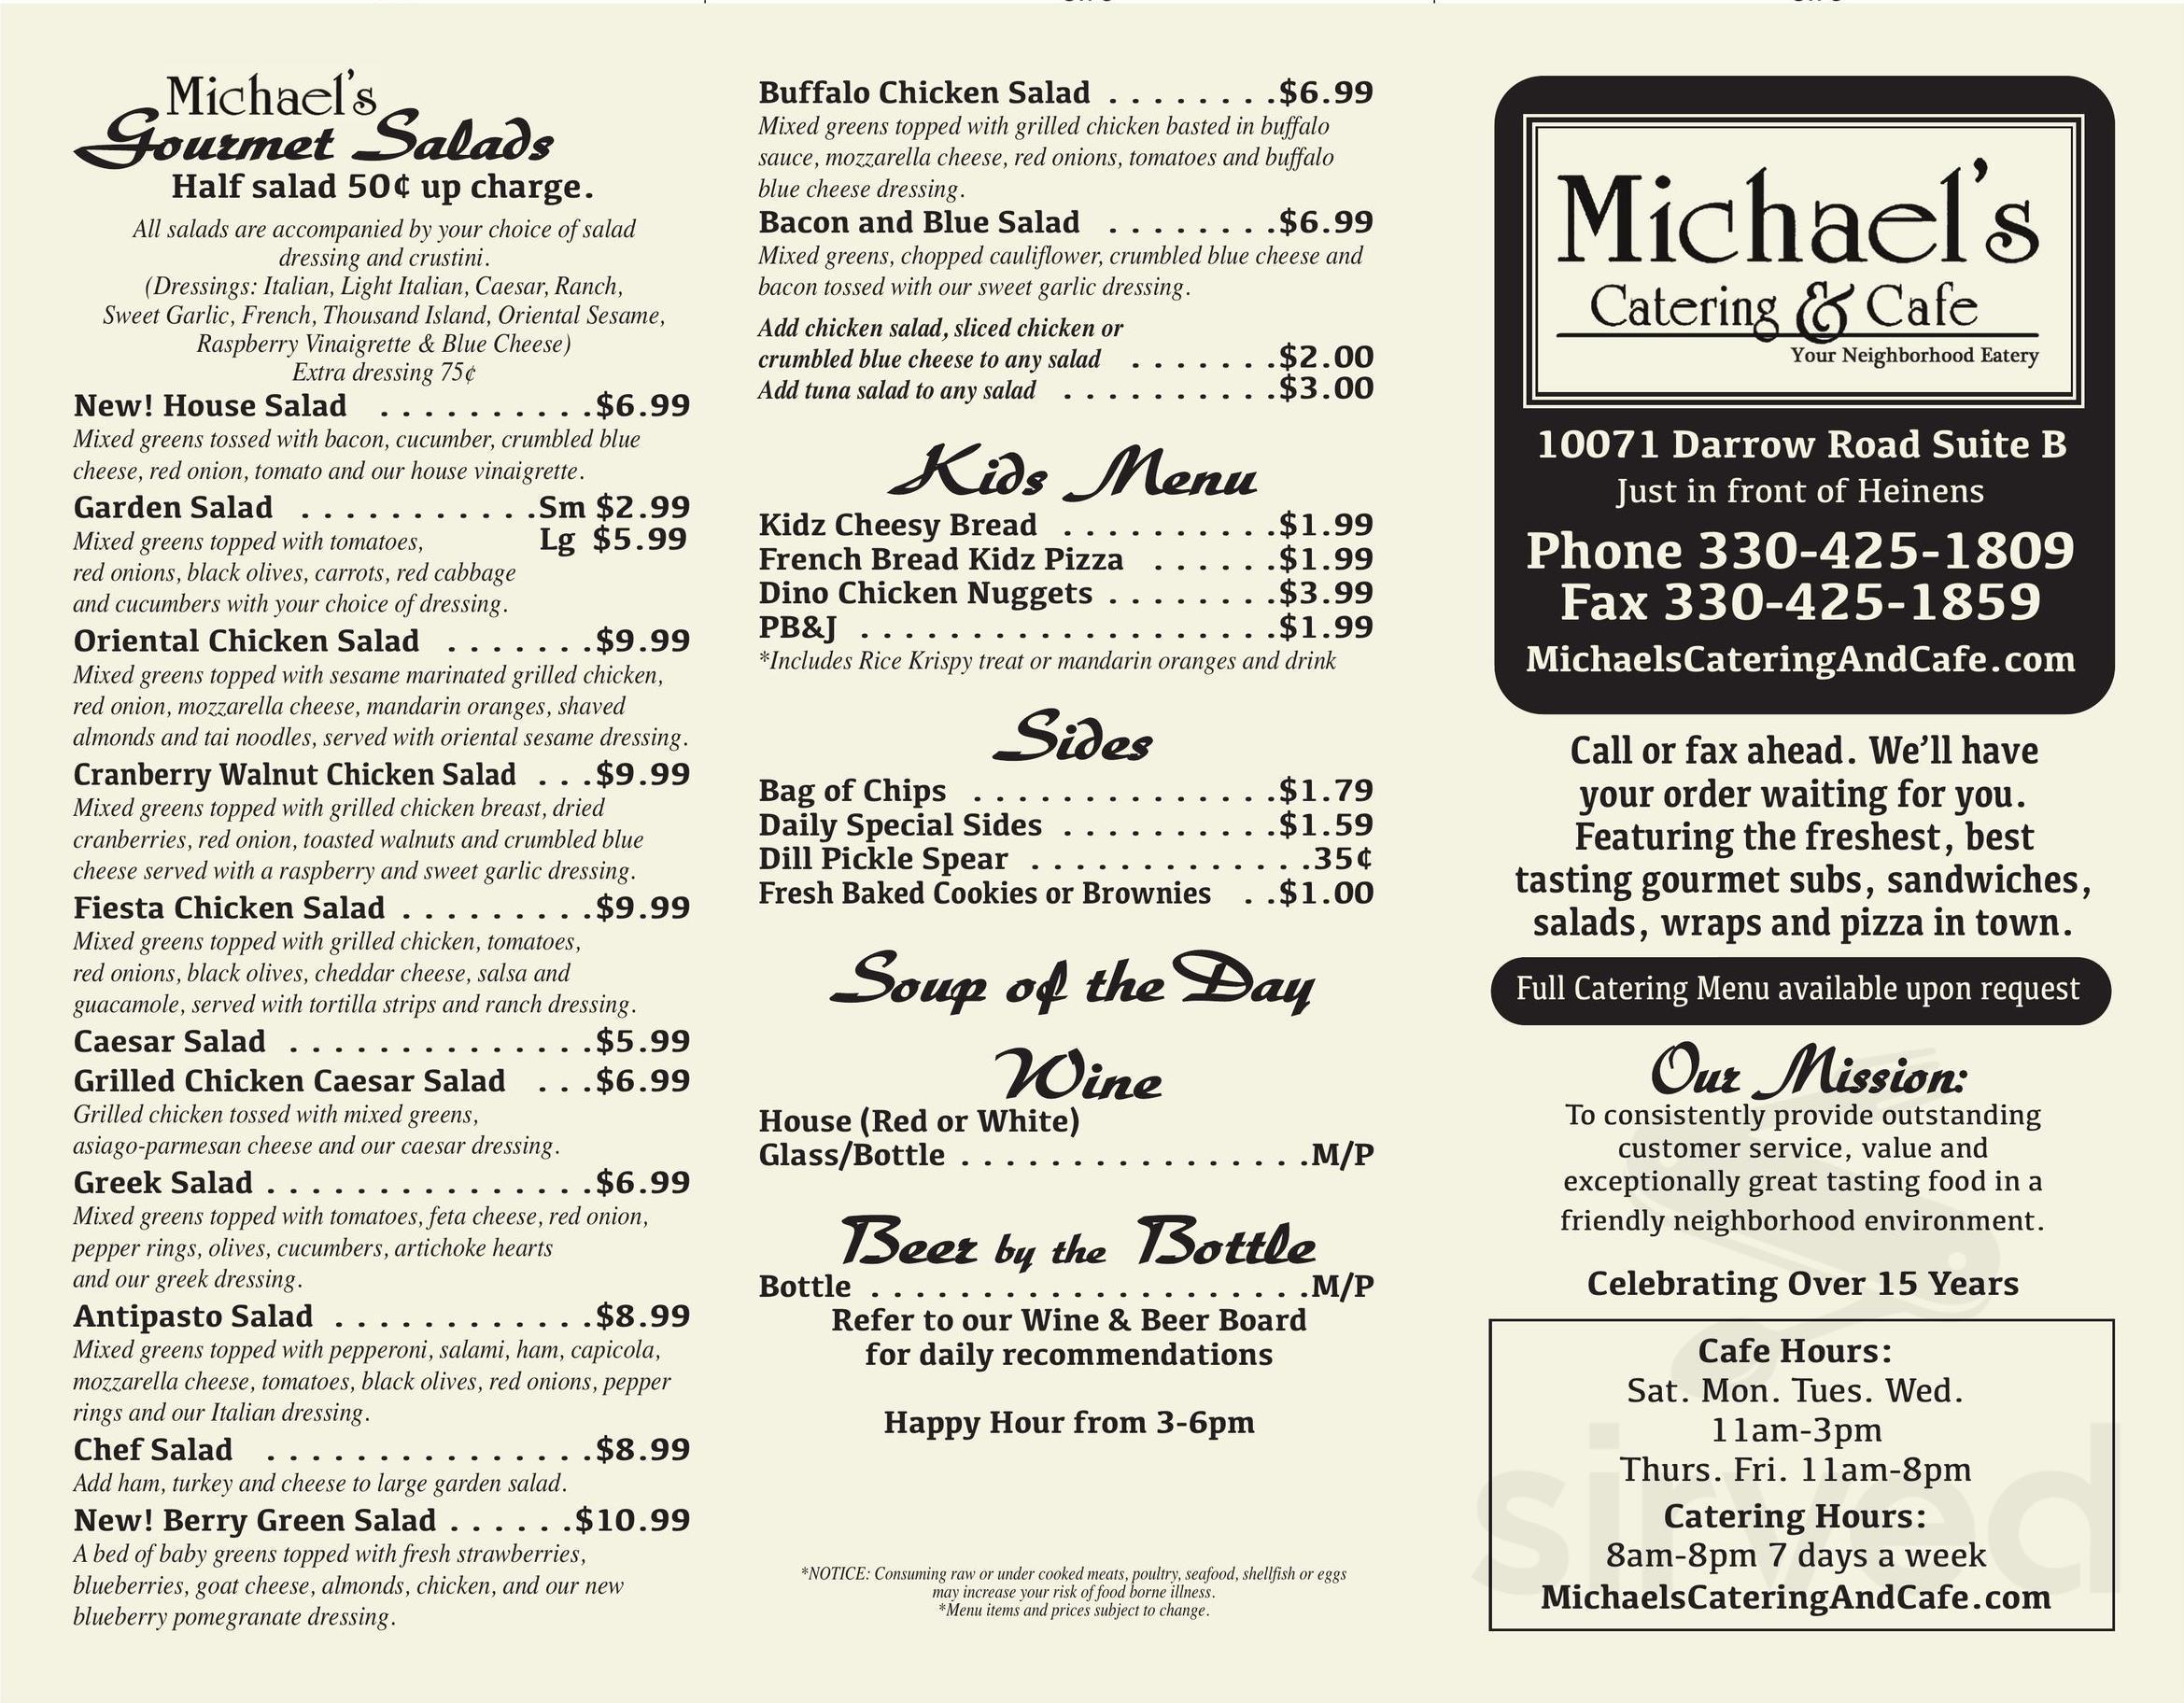 1809 Menu michael's catering & cafe menu in twinsburg, ohio, usa